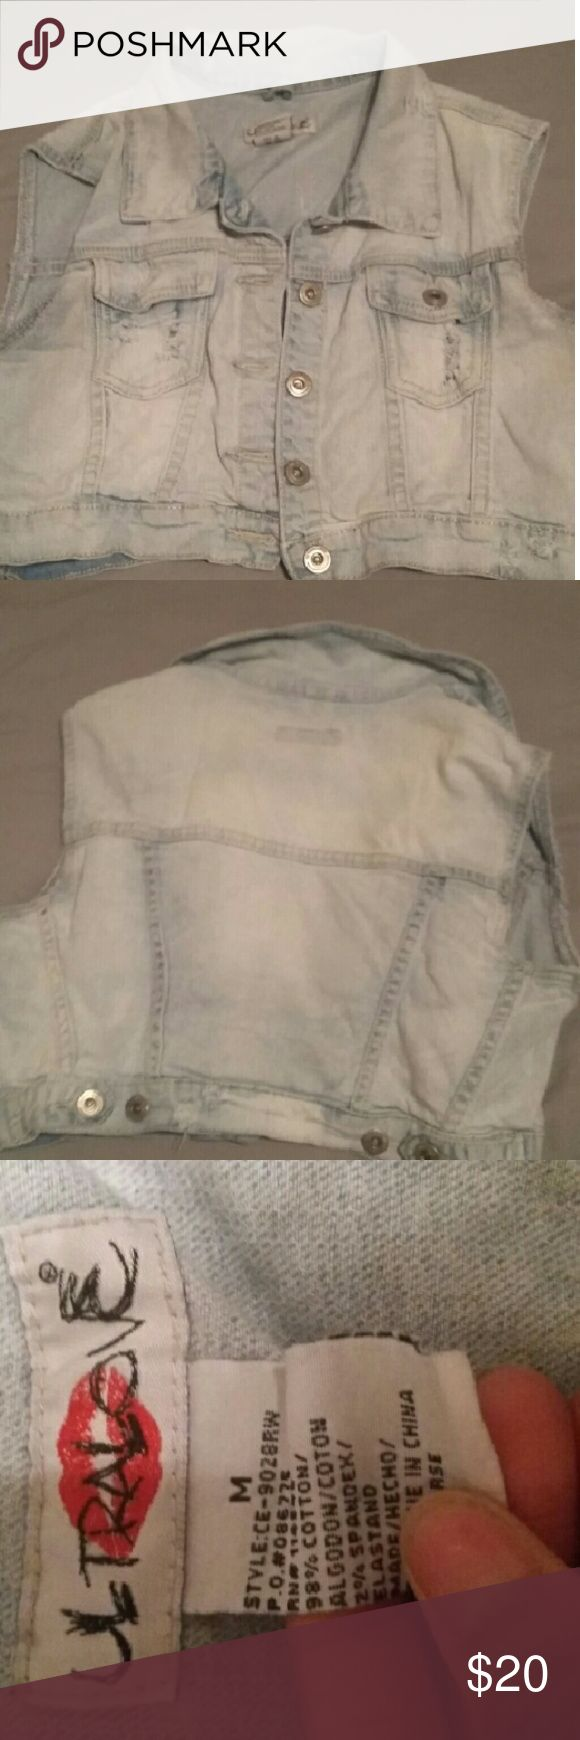 Jean jacket Short sleeve jean jacket Jackets & Coats Jean Jackets